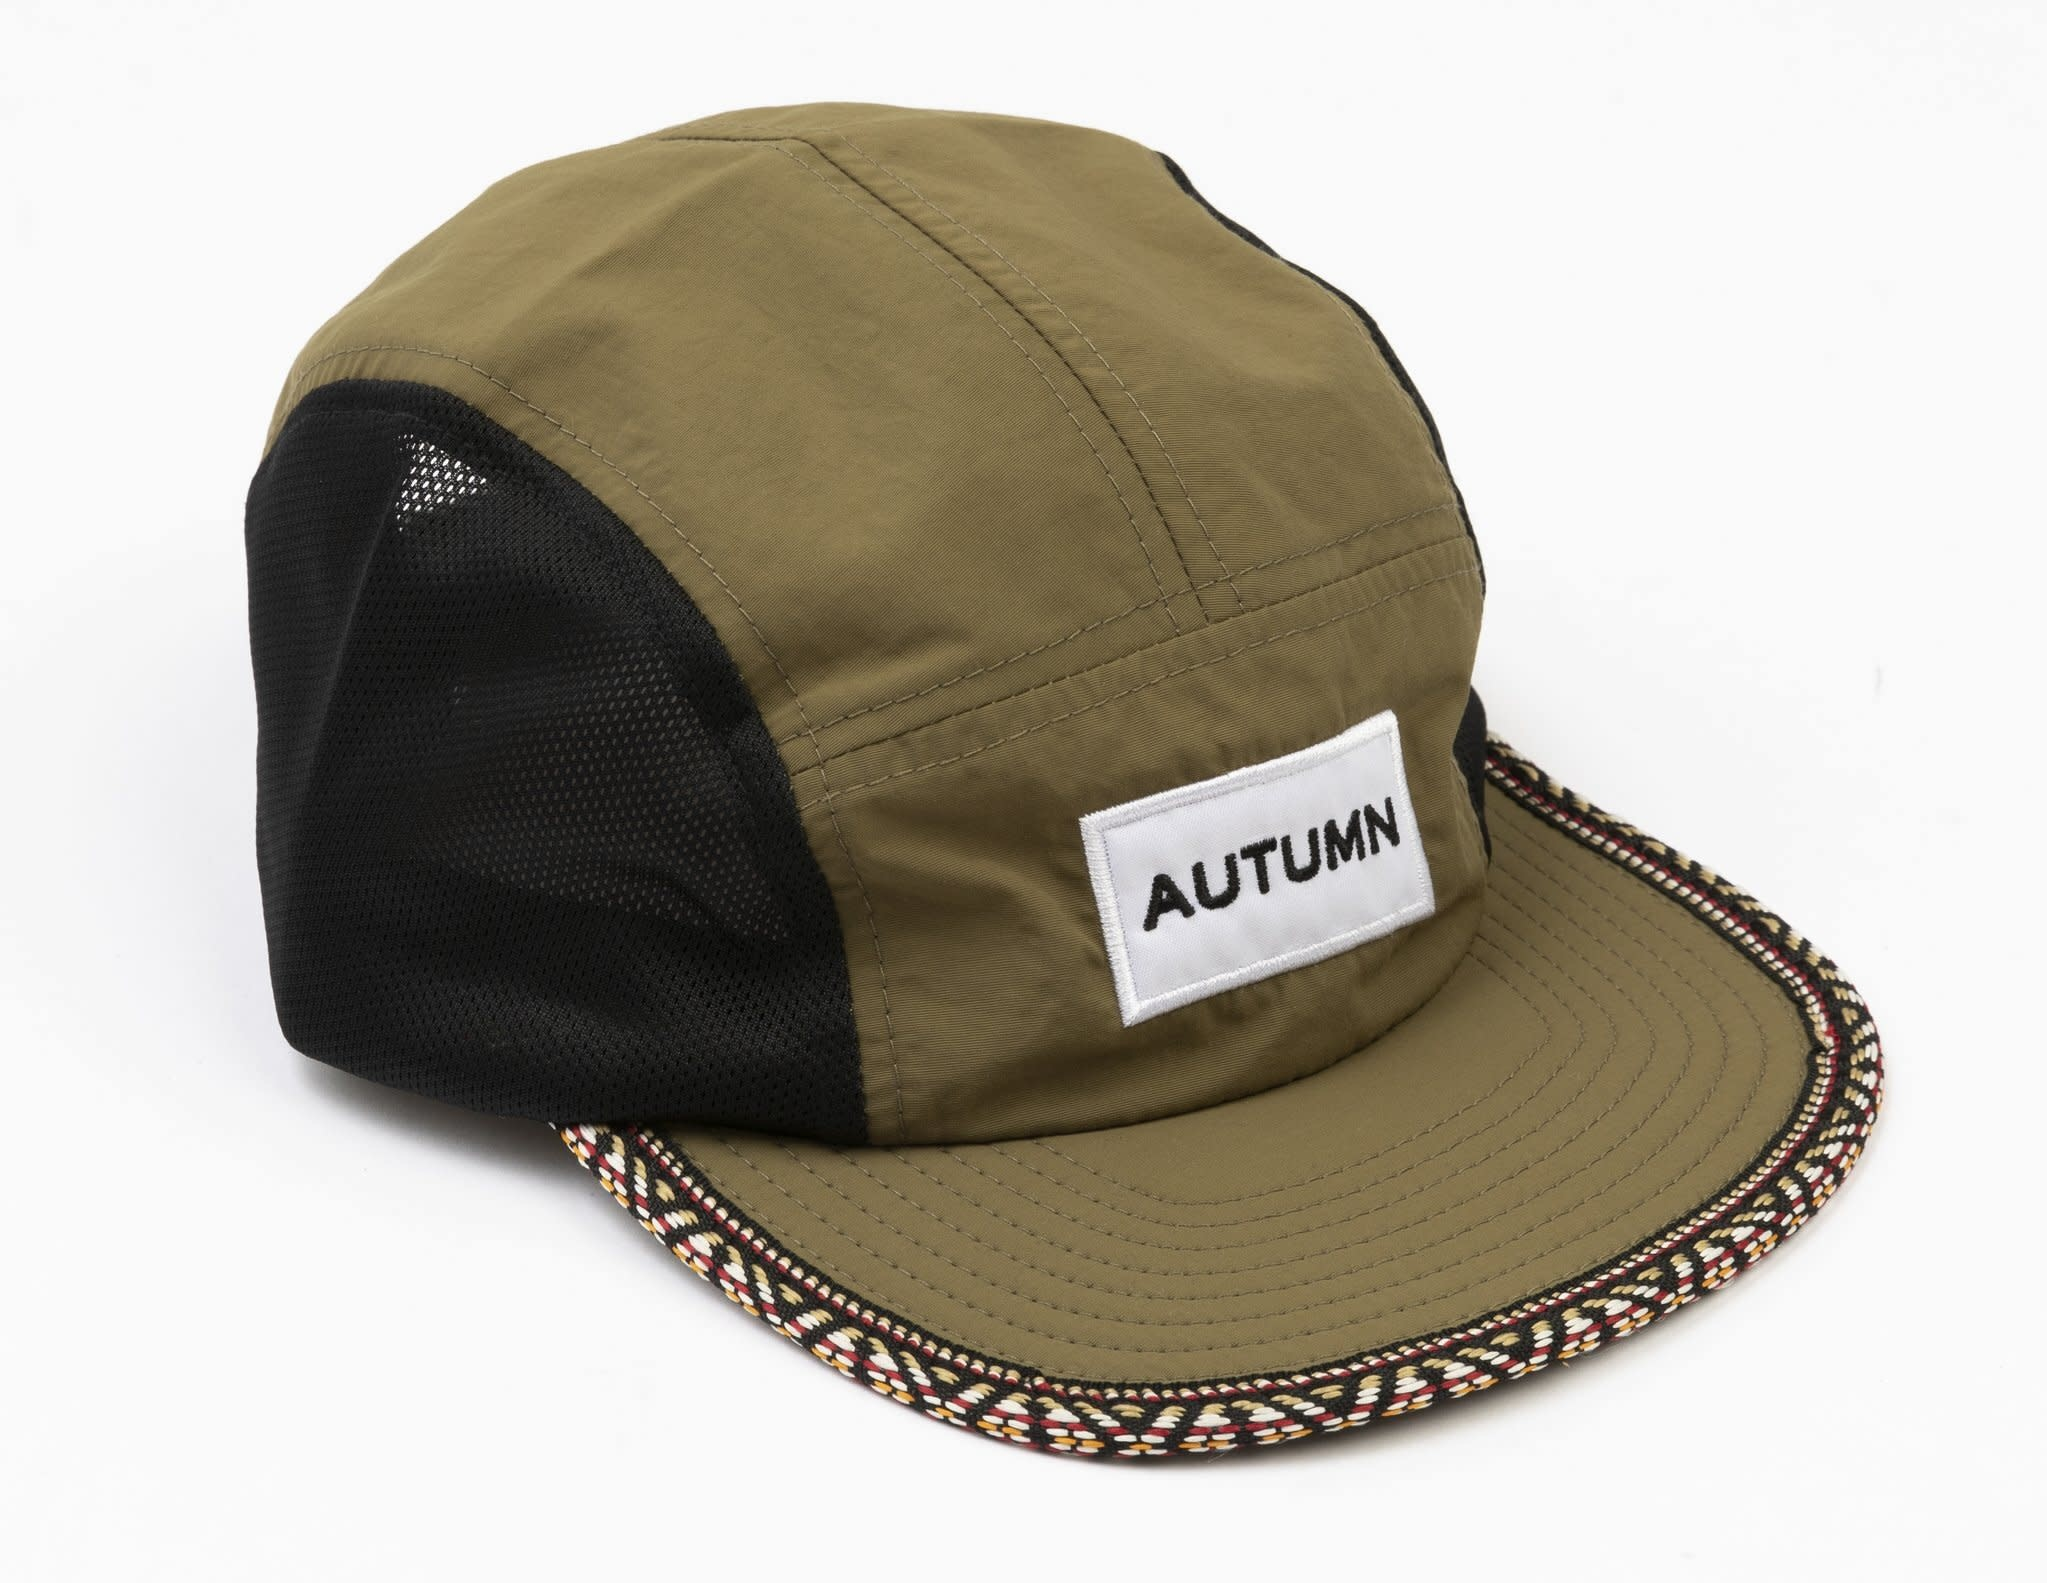 Autumn Autumn Camp Cap